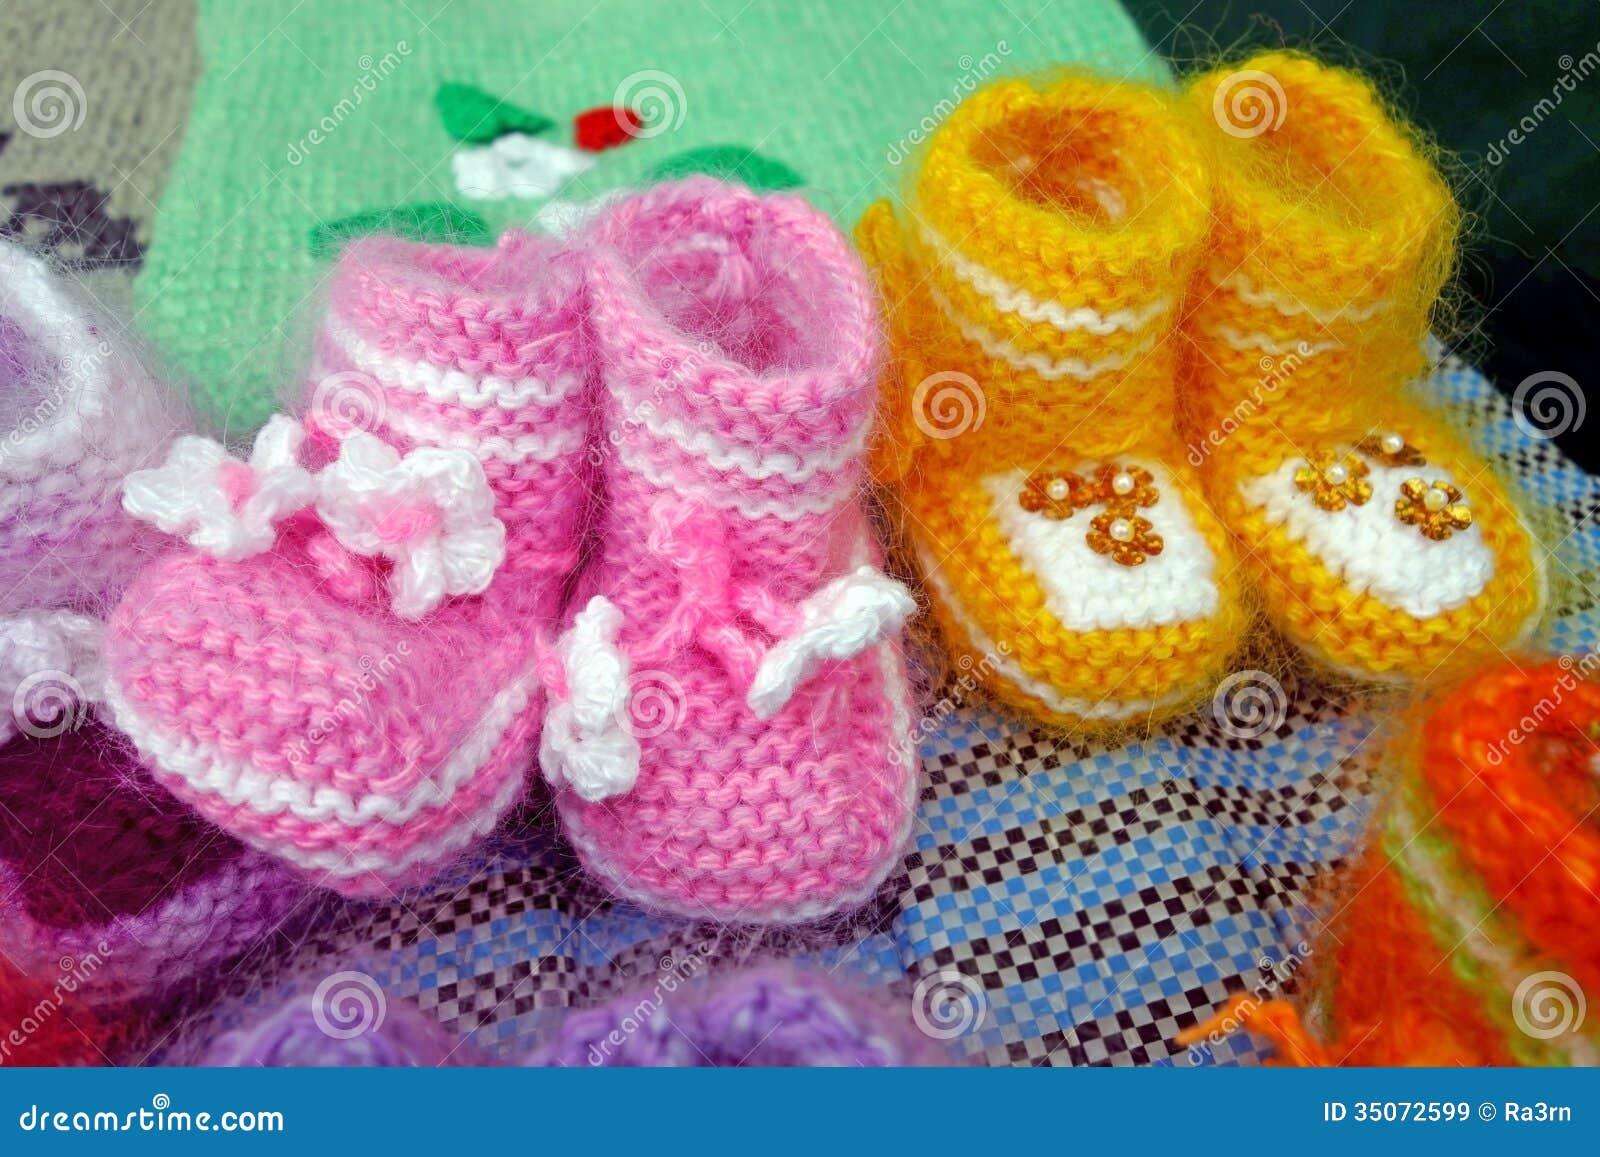 7663ae151260 Δύο ζευγάρια των μάλλινων πλεκτών παπουτσιών μωρών. Φωτογραφία που έχει  ληφθεί  October 12th